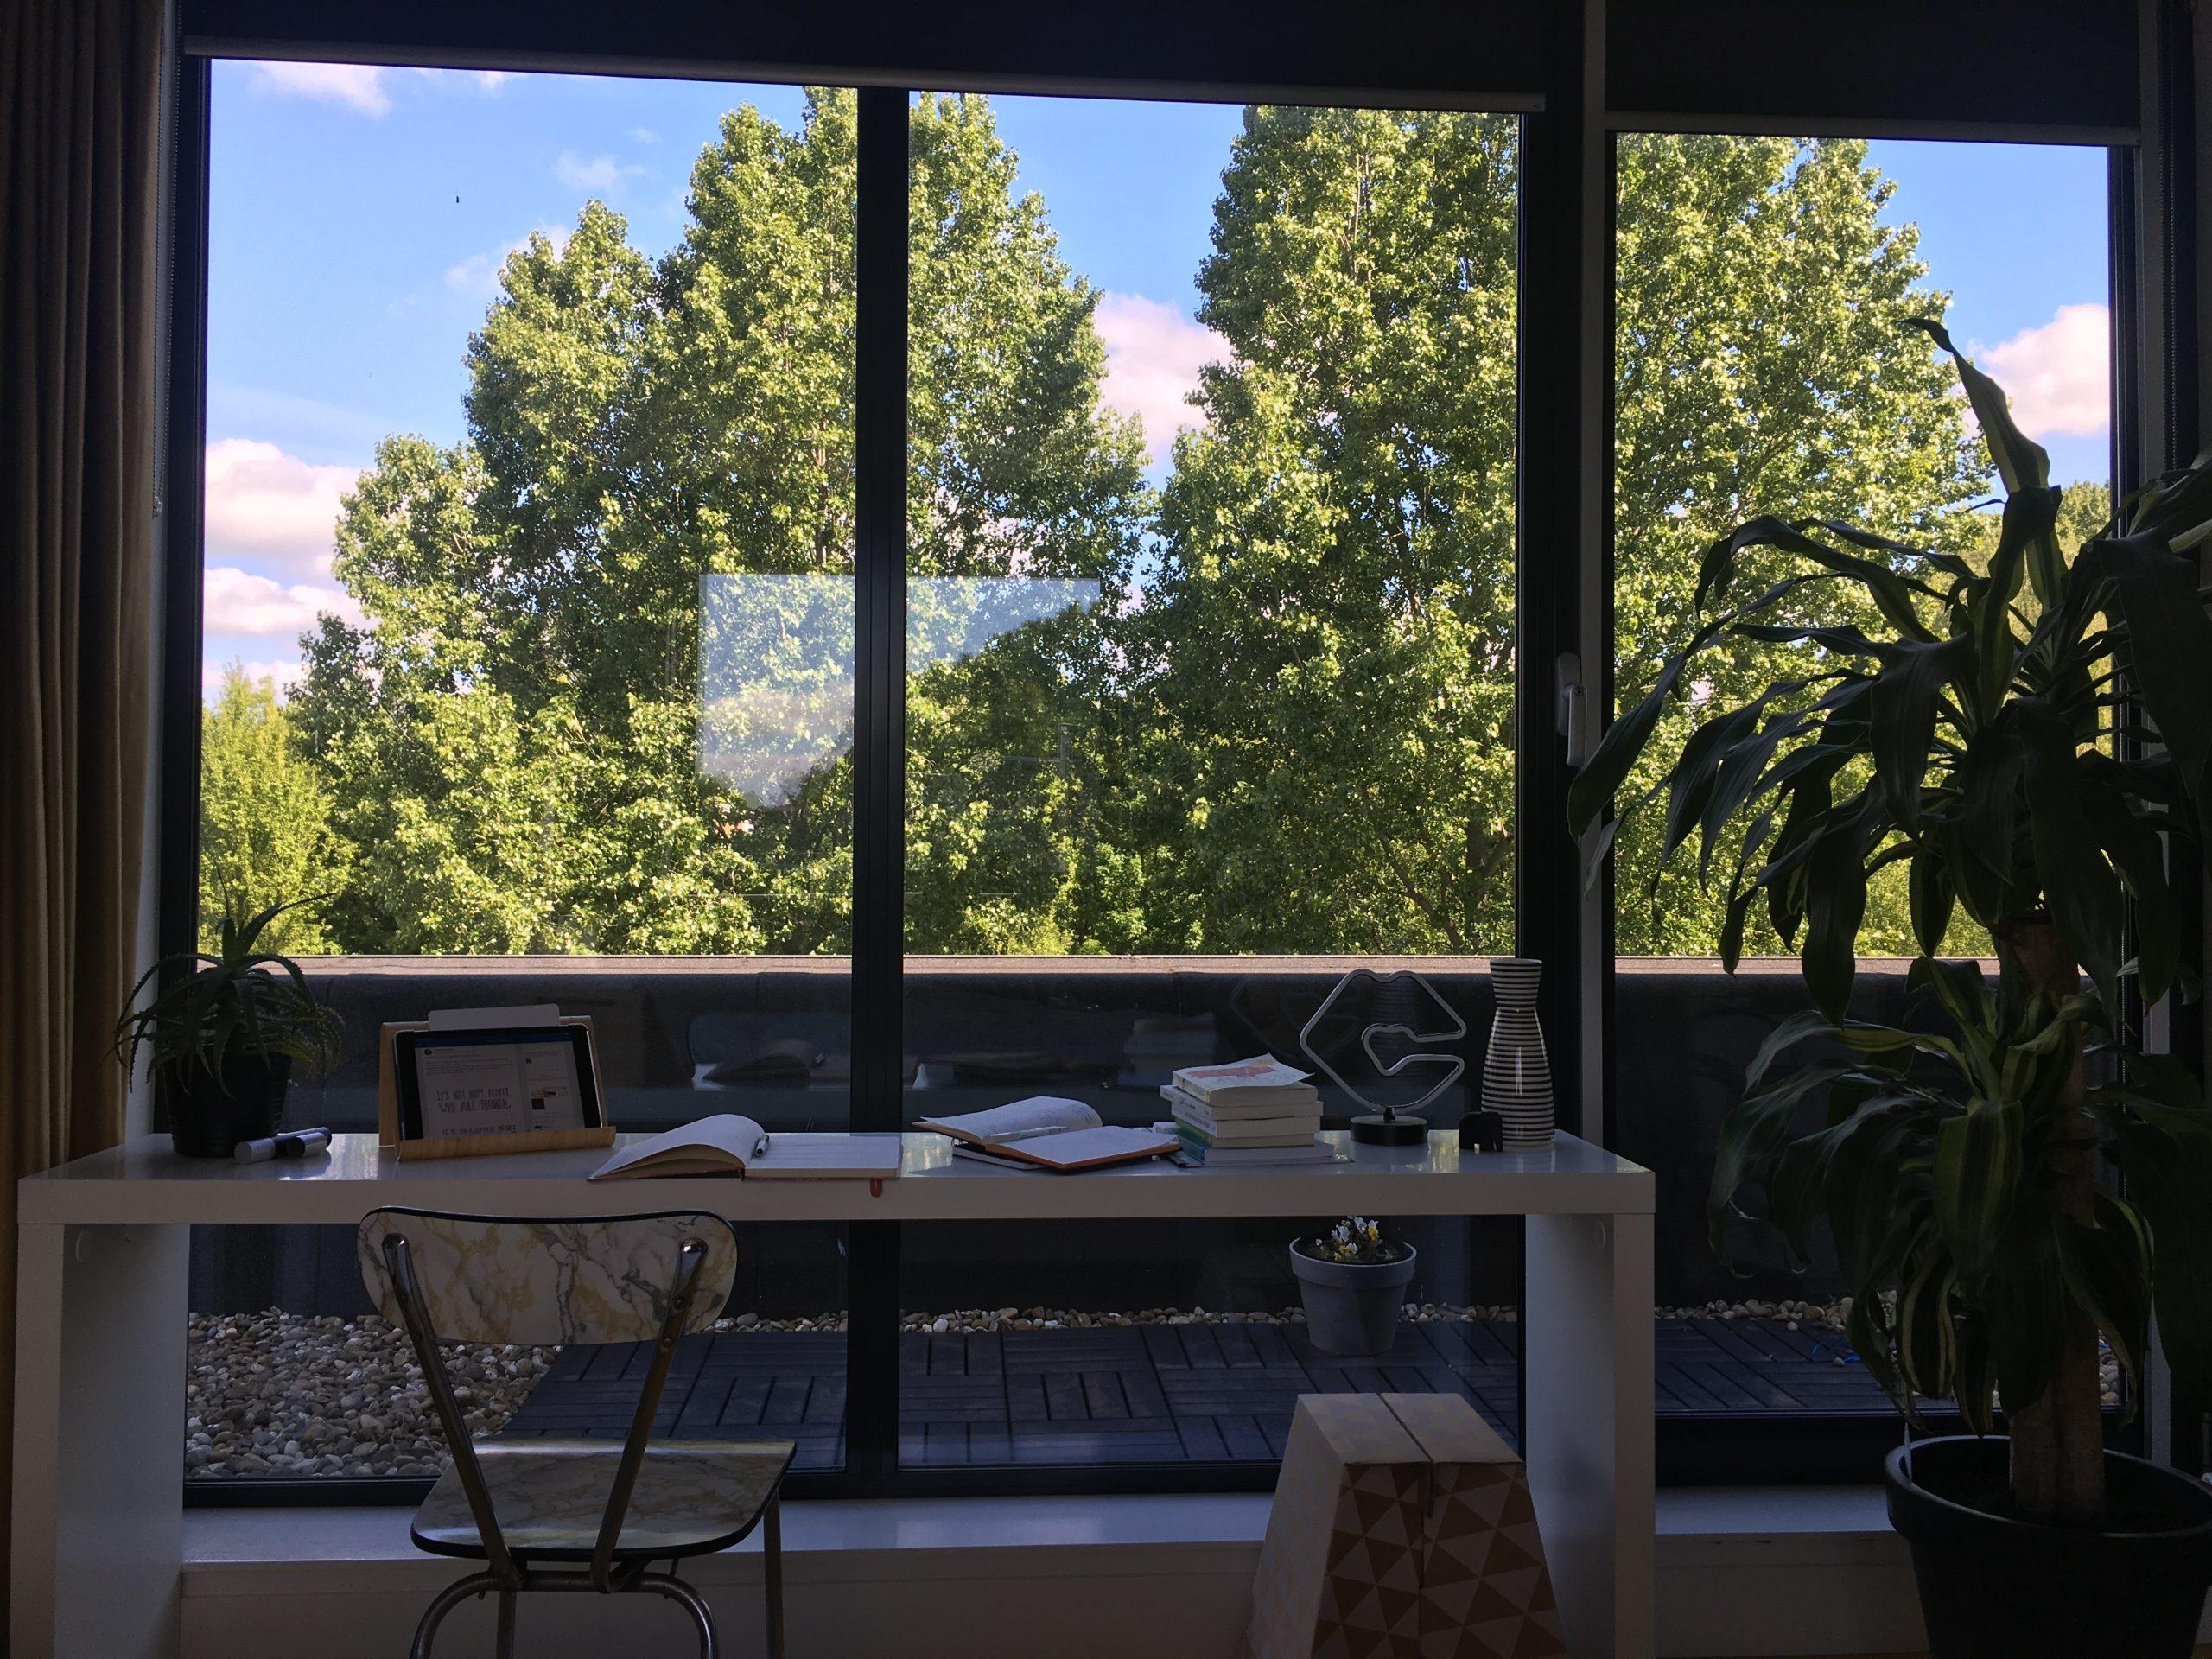 Homecoachclub - my penthouse - de parel op ons huis